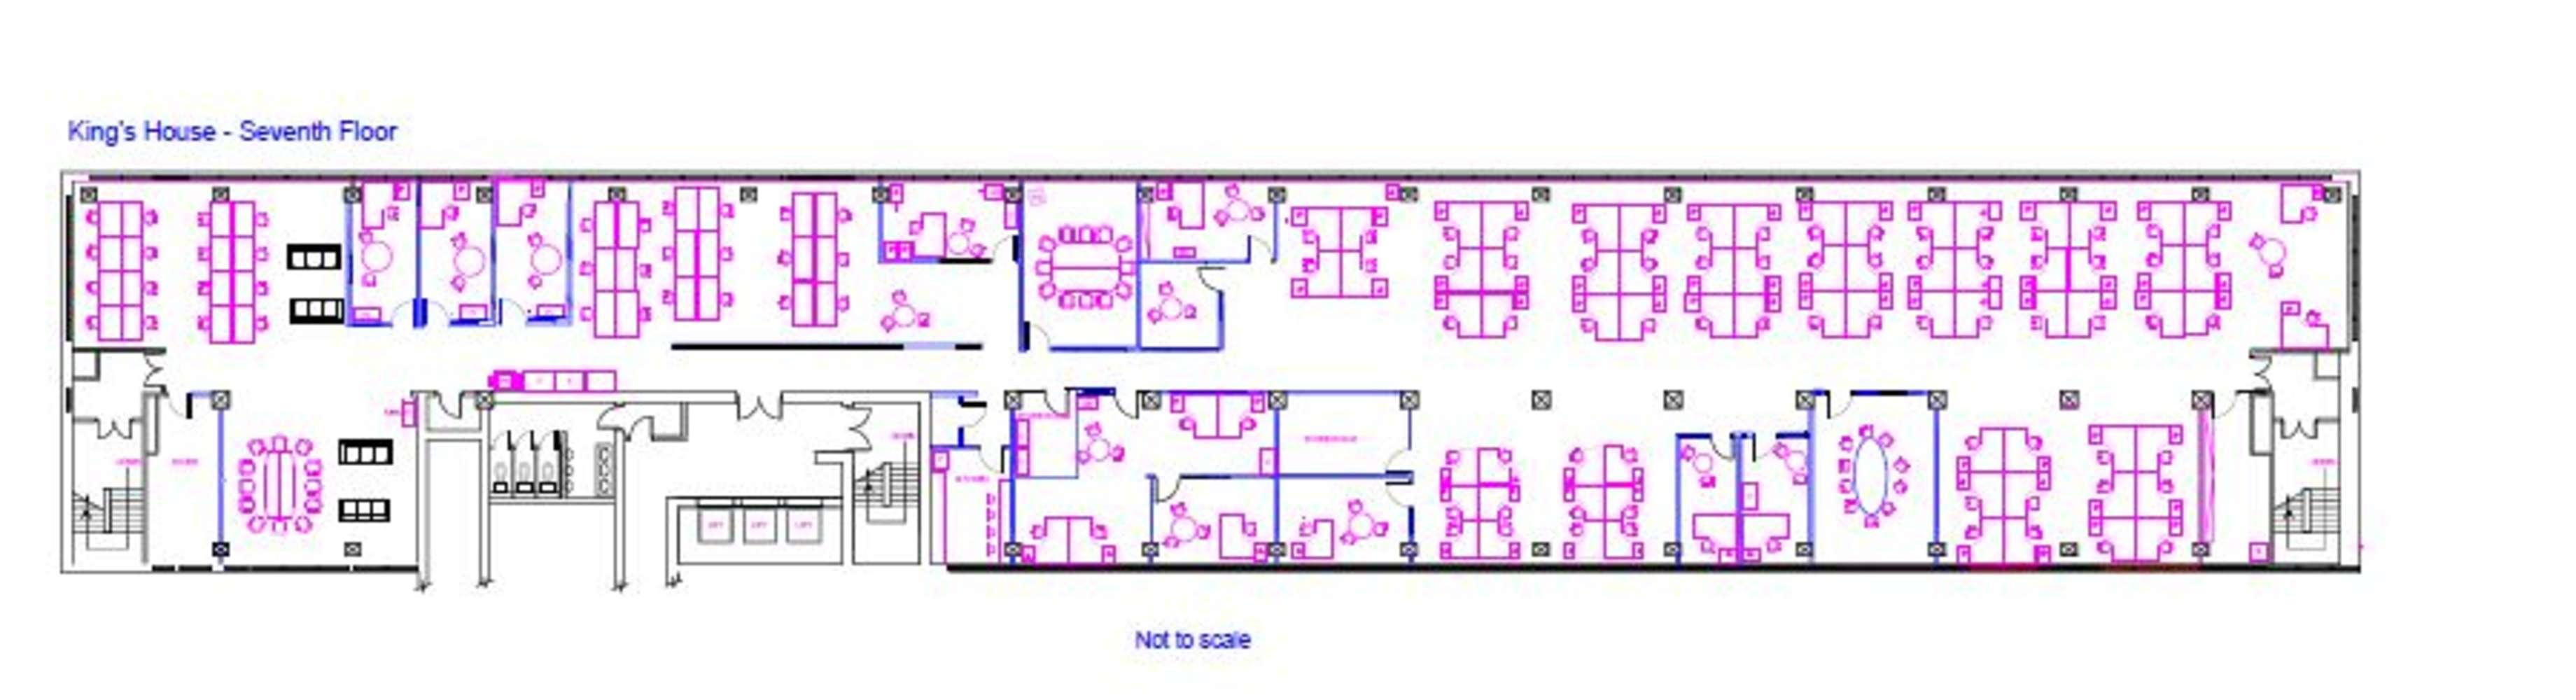 Office Harrow, HA1 1PT - Kings House - 4